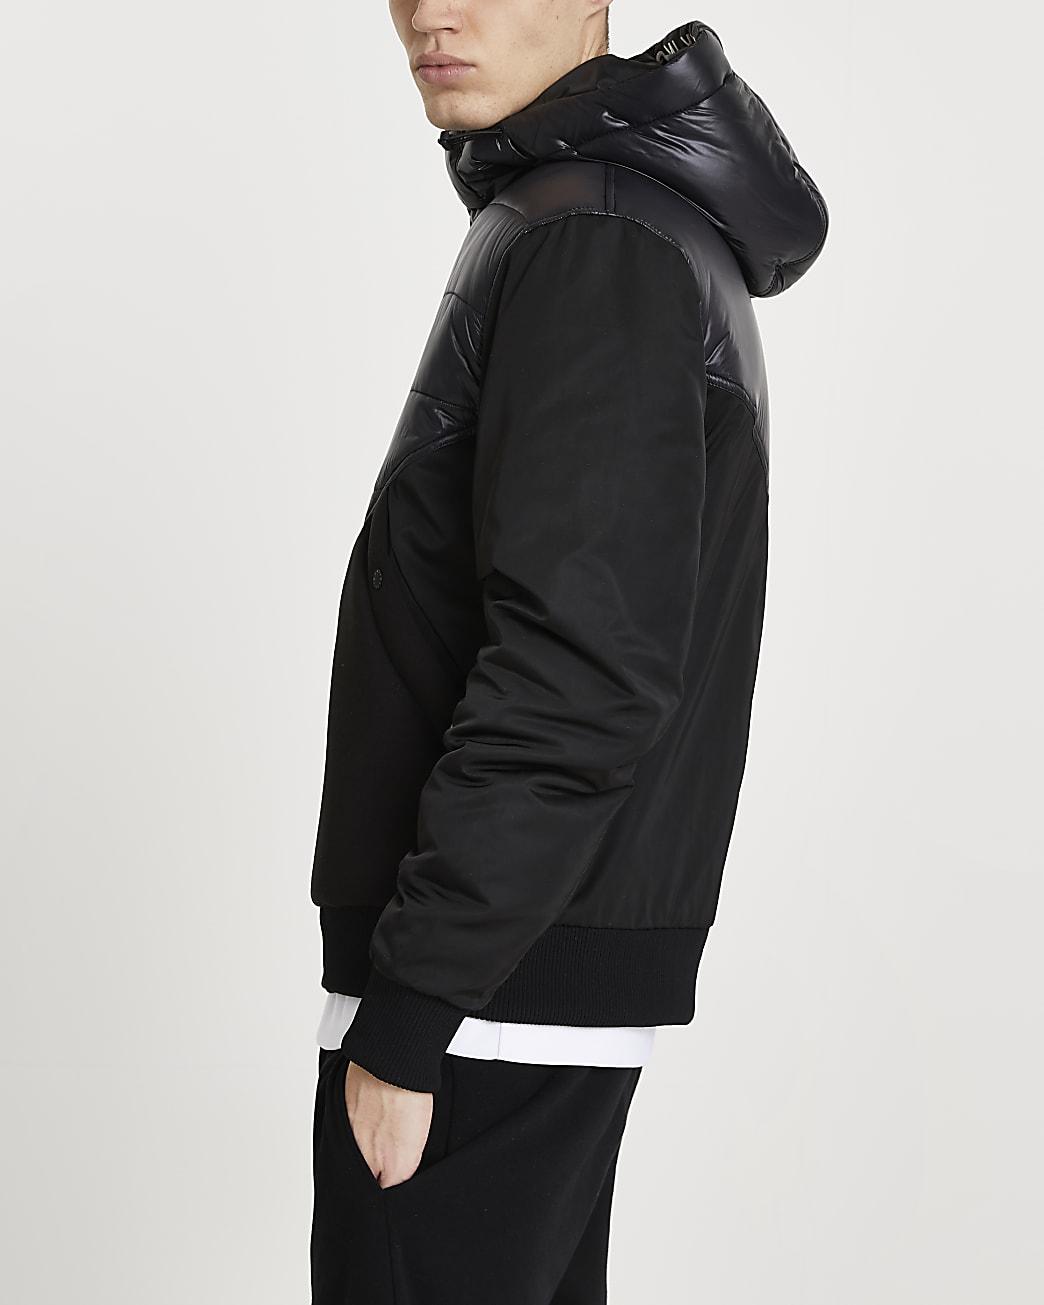 MCMLX black hooded bomber jacket